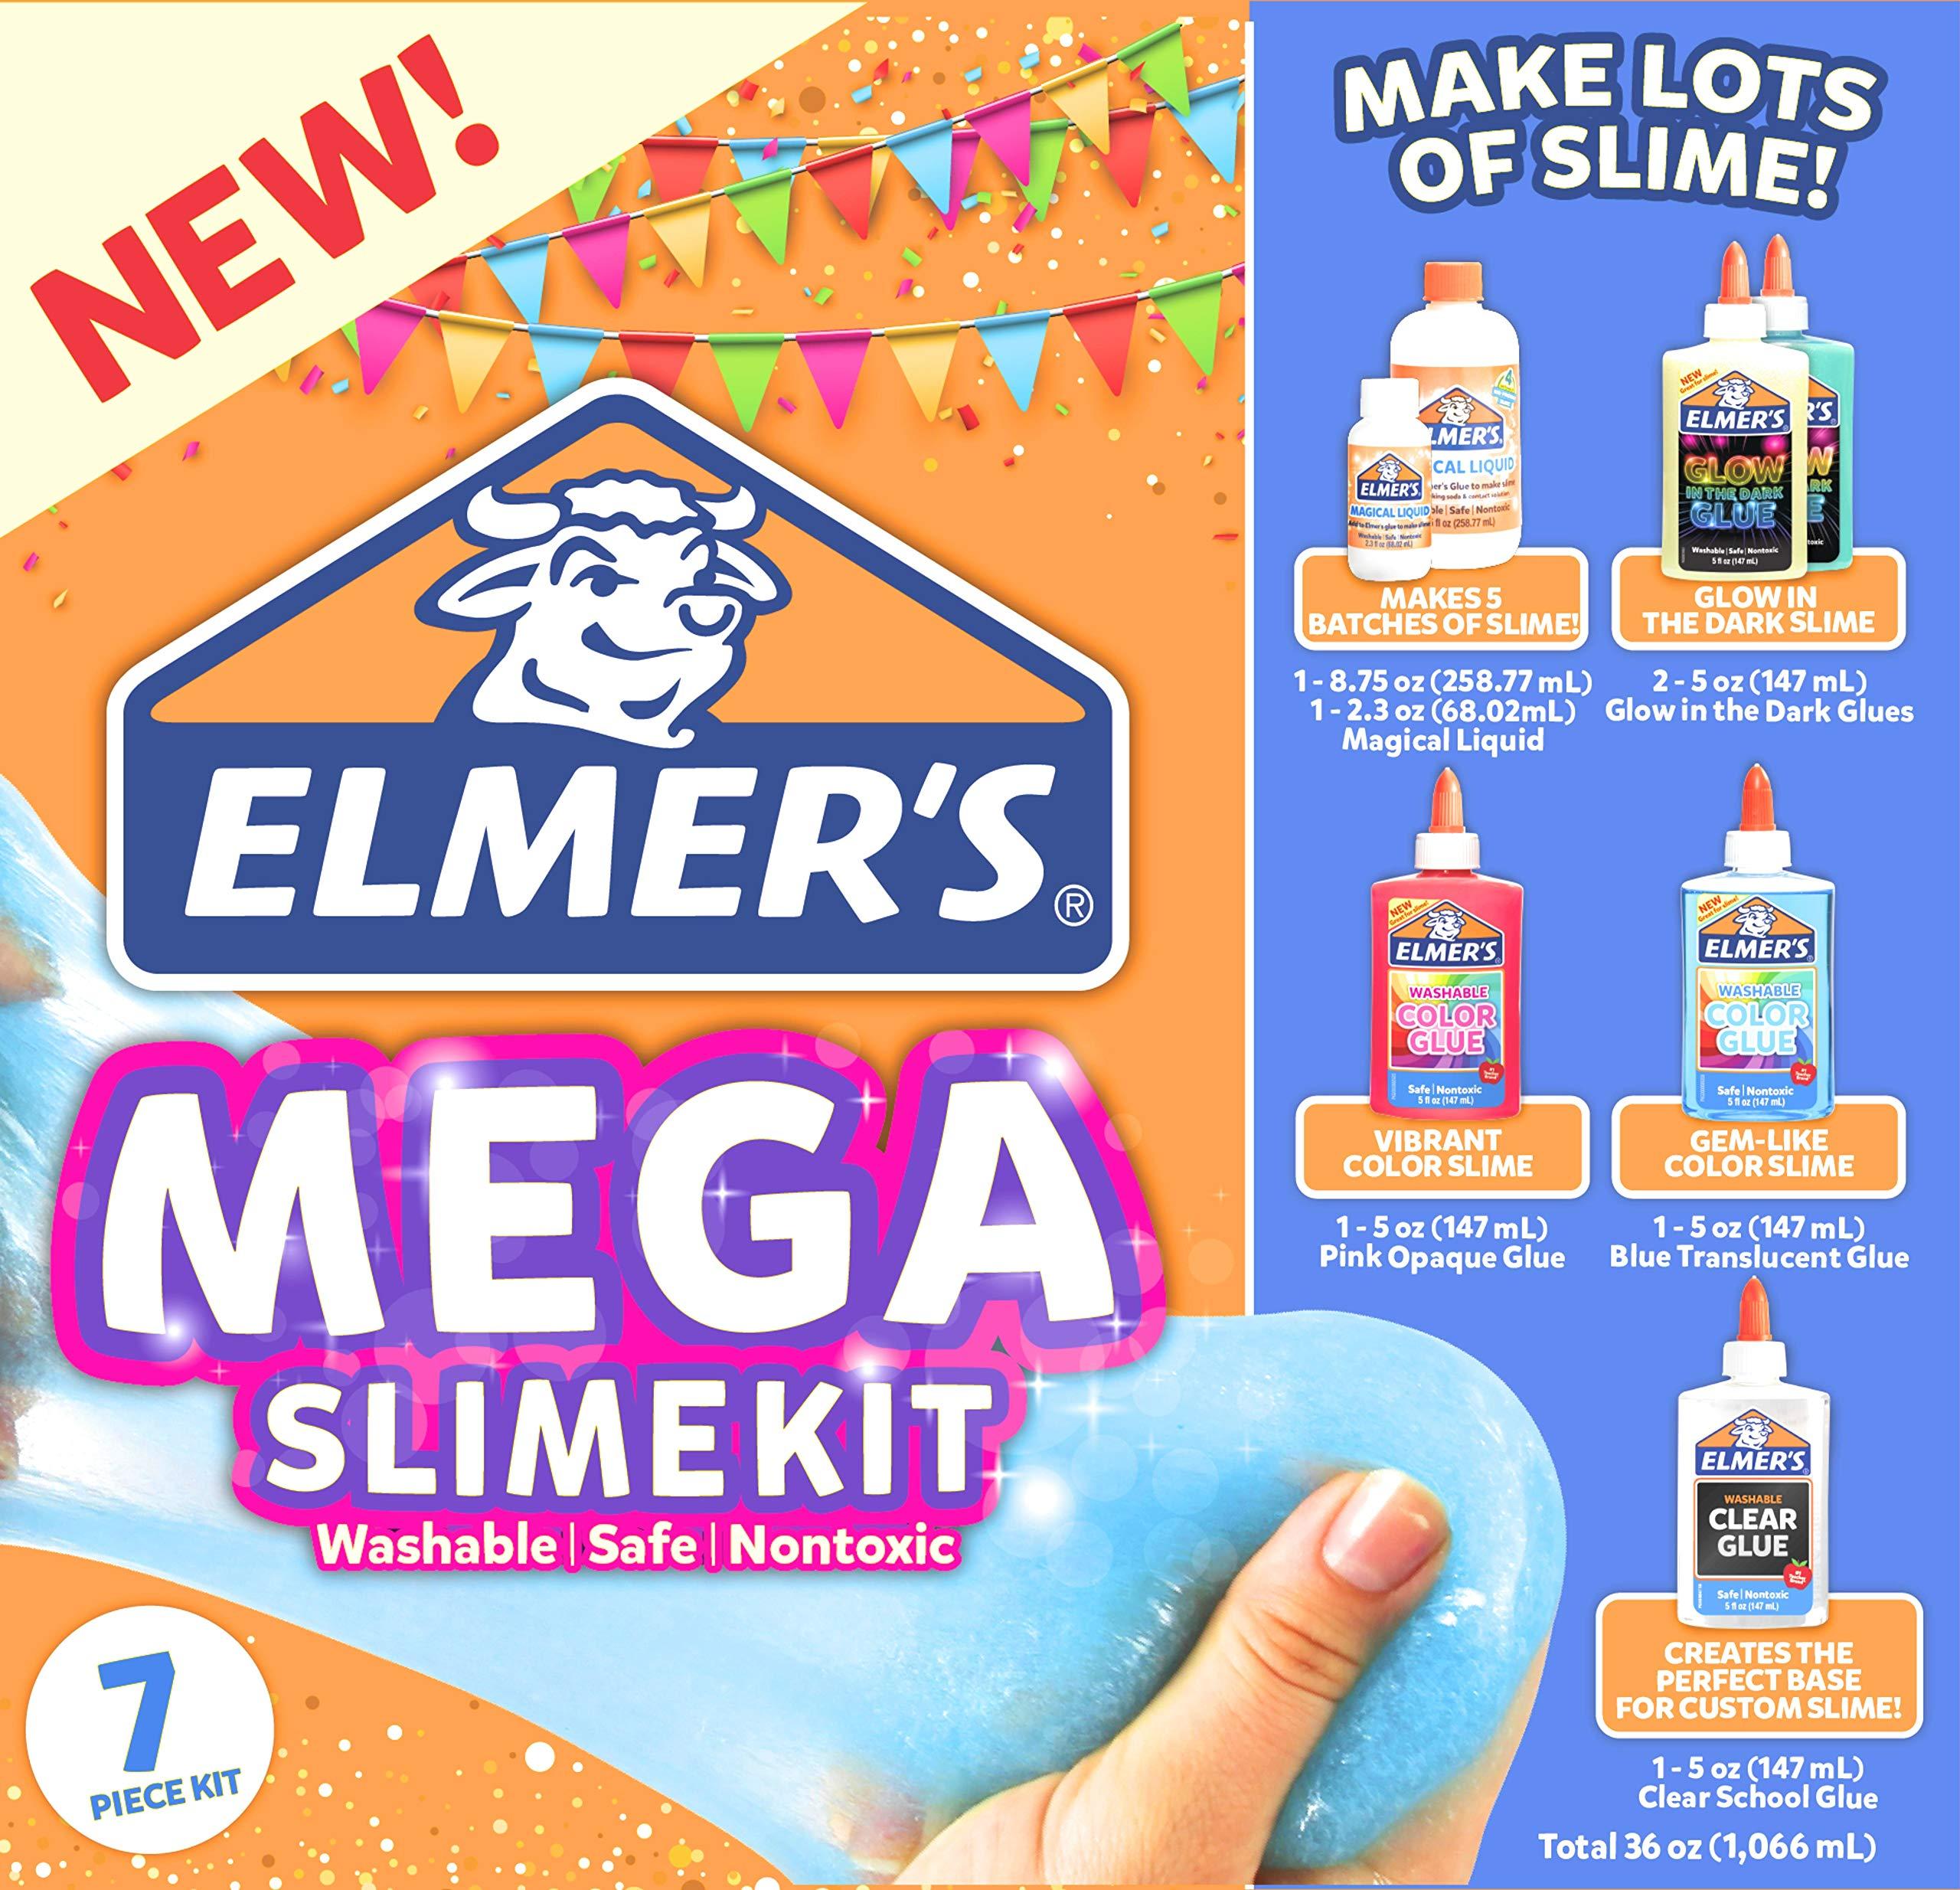 Elmer's Mega Slime Kit Glow in The Dark and Gem-Like Slime